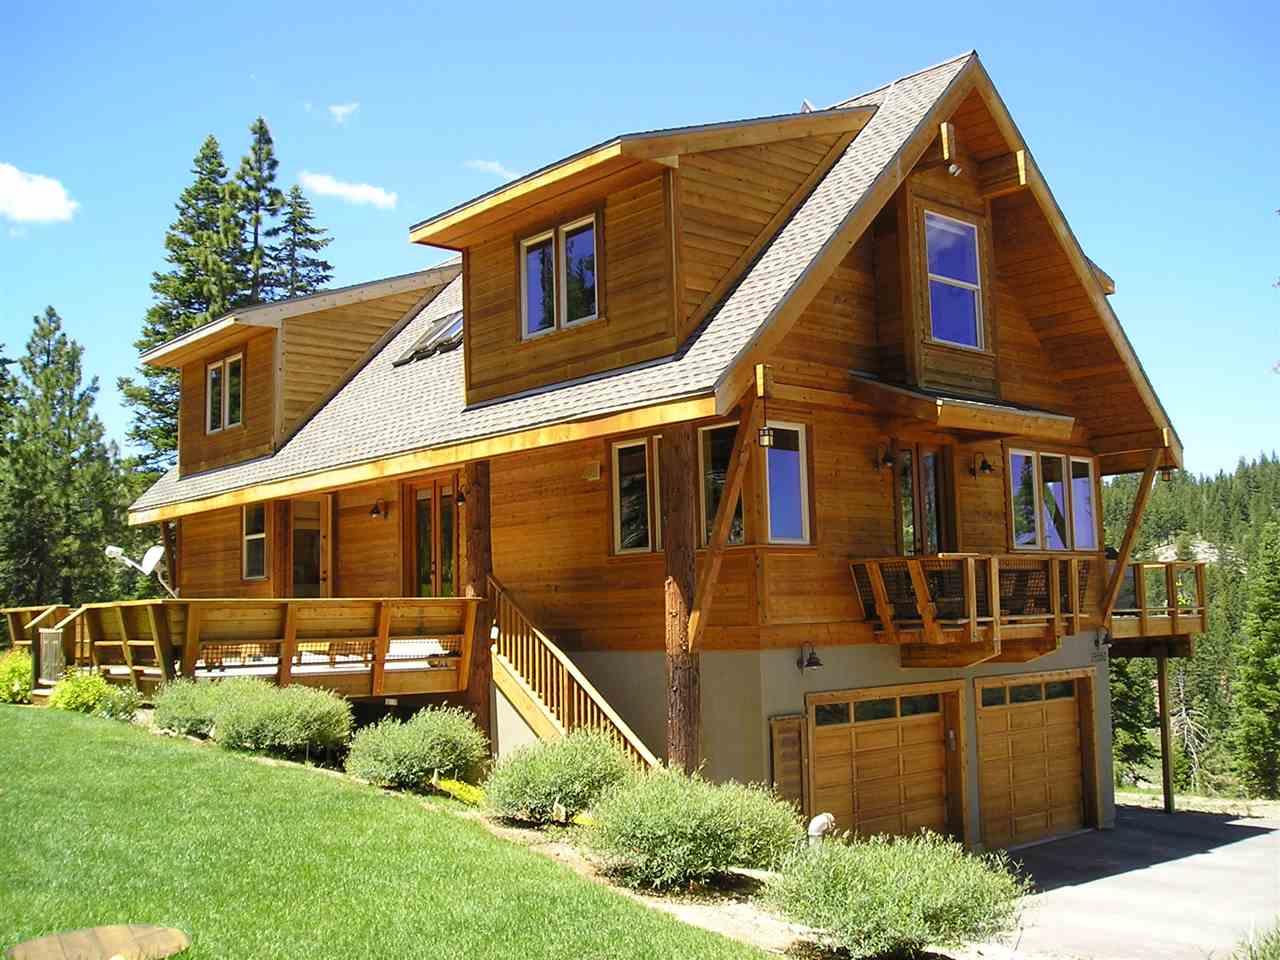 Single Family Home for Active at 19550 La Mirada Road 19550 La Mirada Road Truckee, California 96161 United States